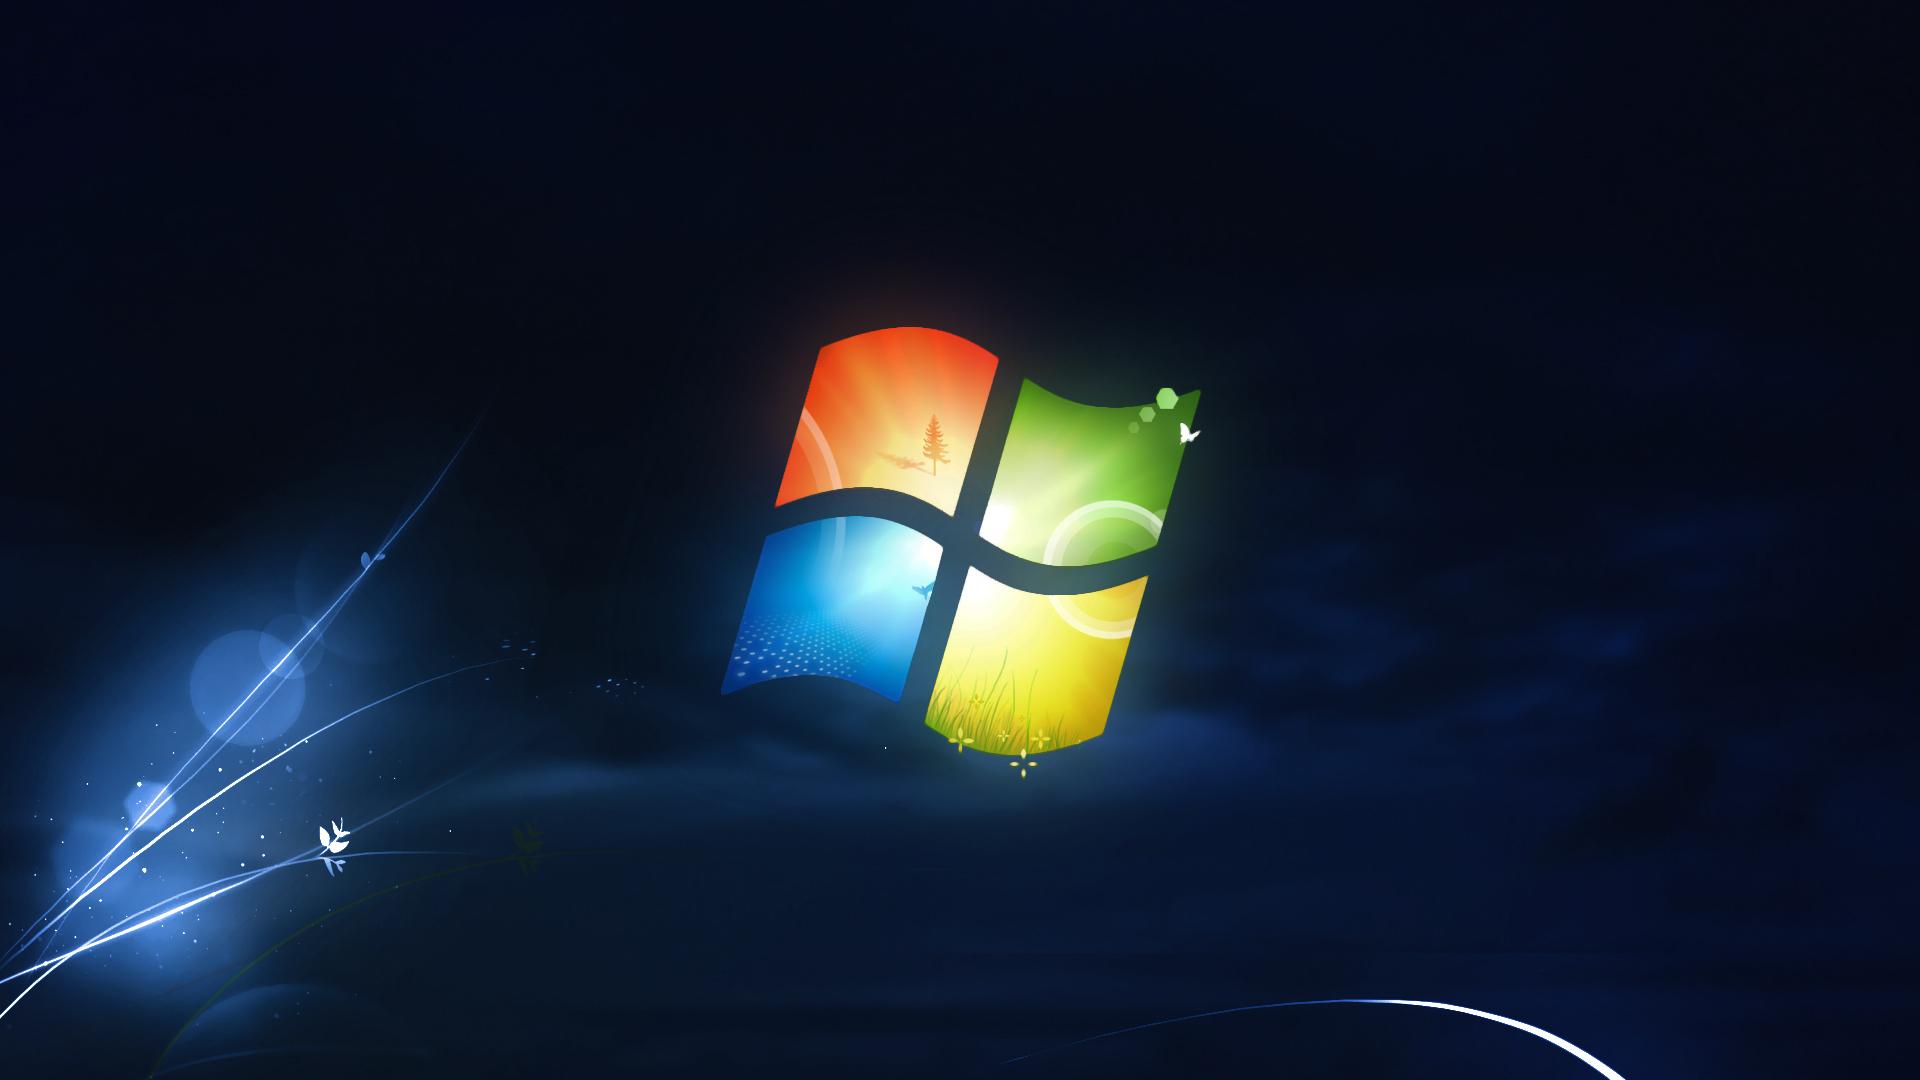 Windows 7 Black Wallpaper Hd wallpaper   796606 1920x1080